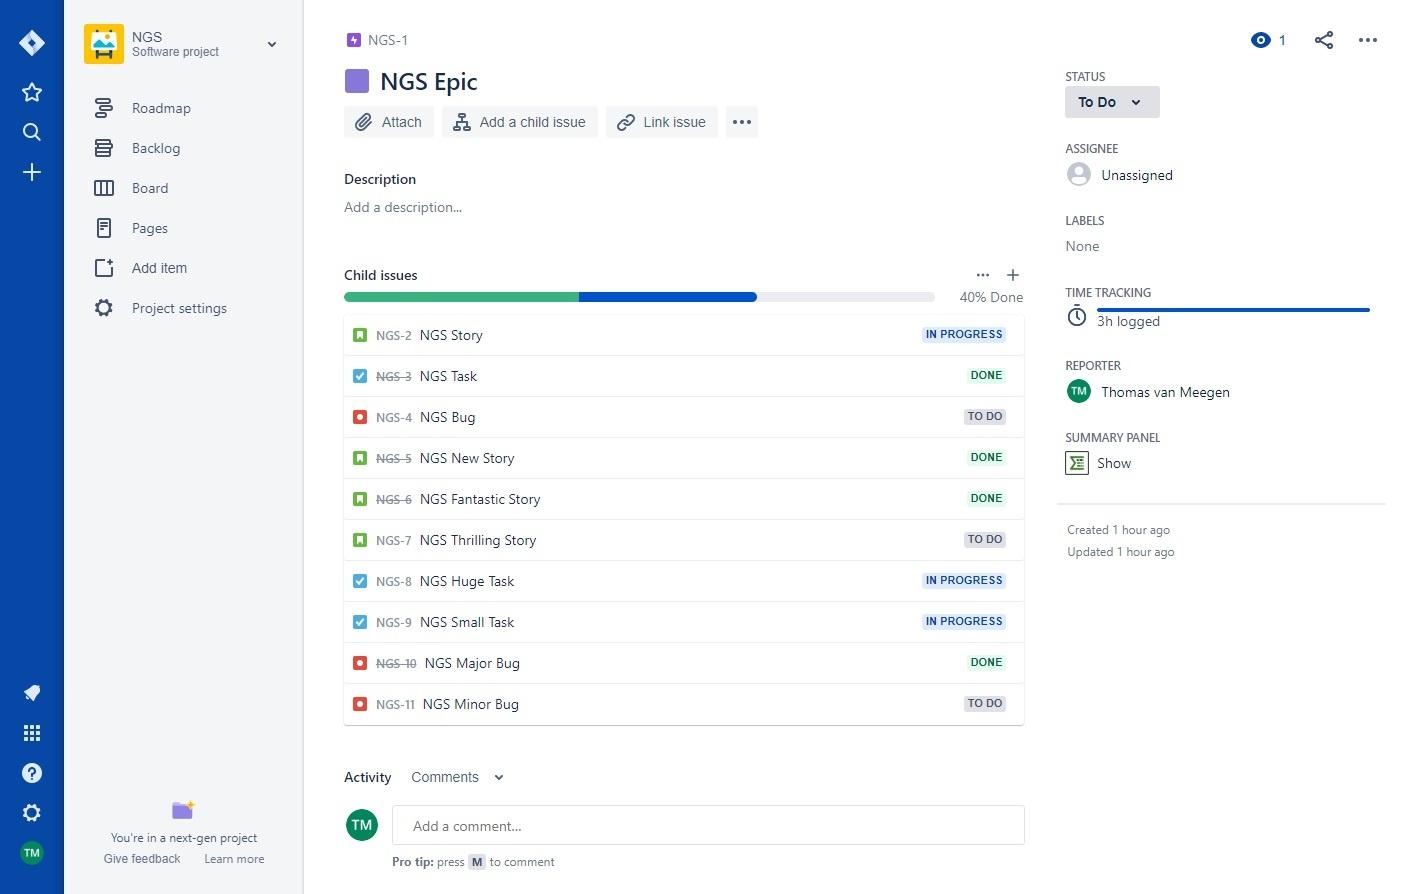 Epic Sum Up Cloud Update: Better Summary Panel